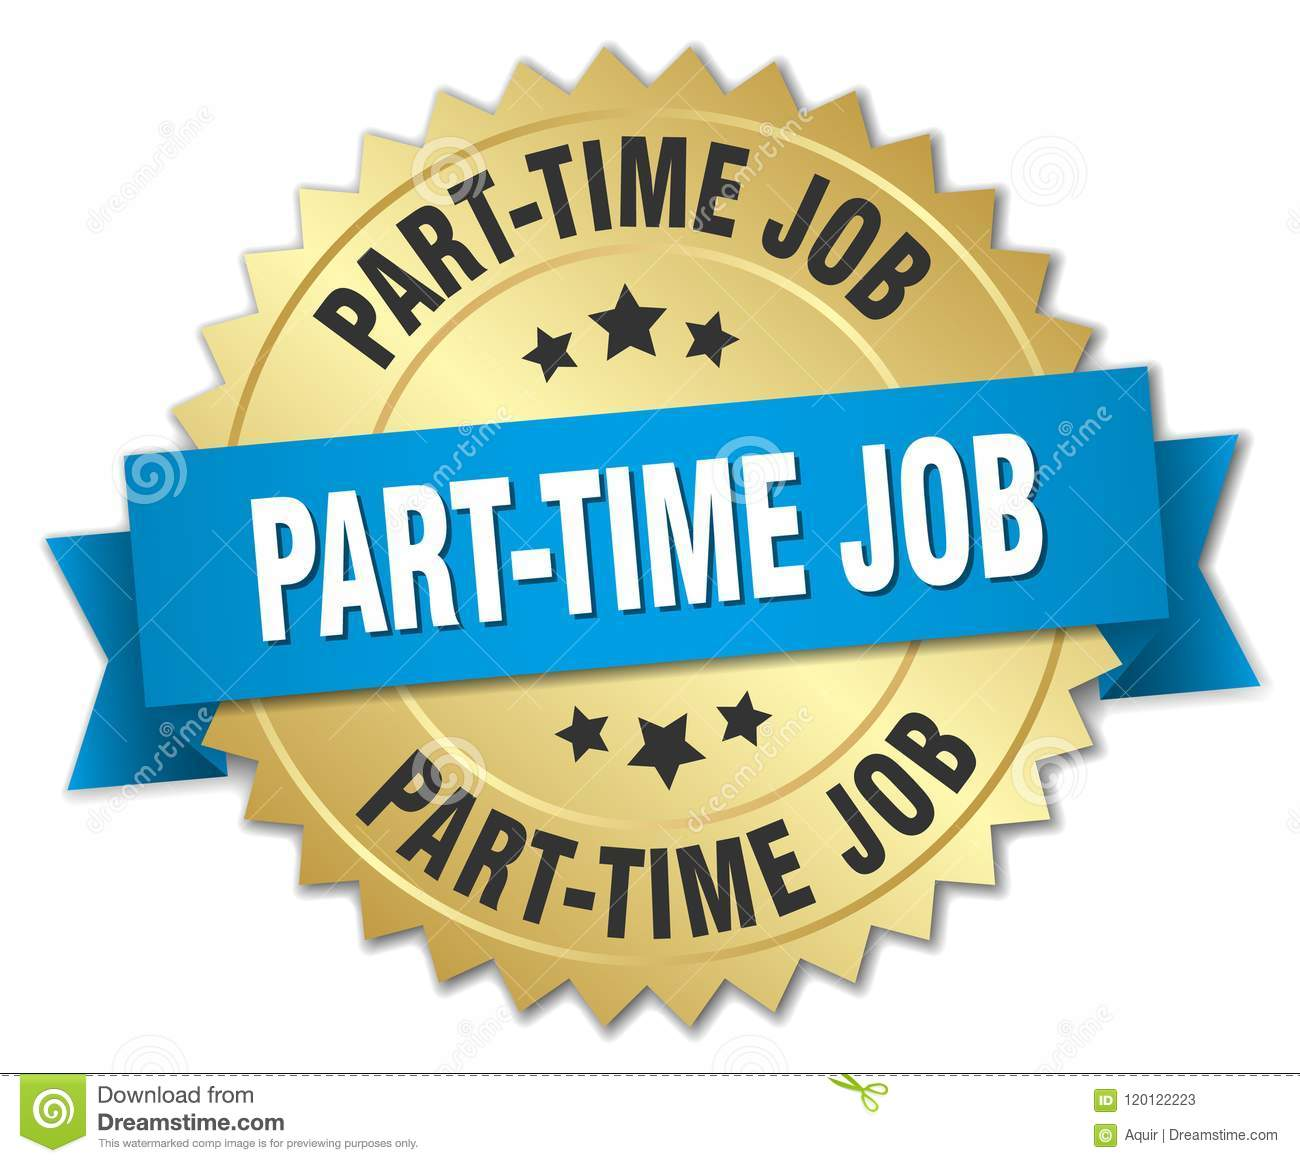 Part time free jobs